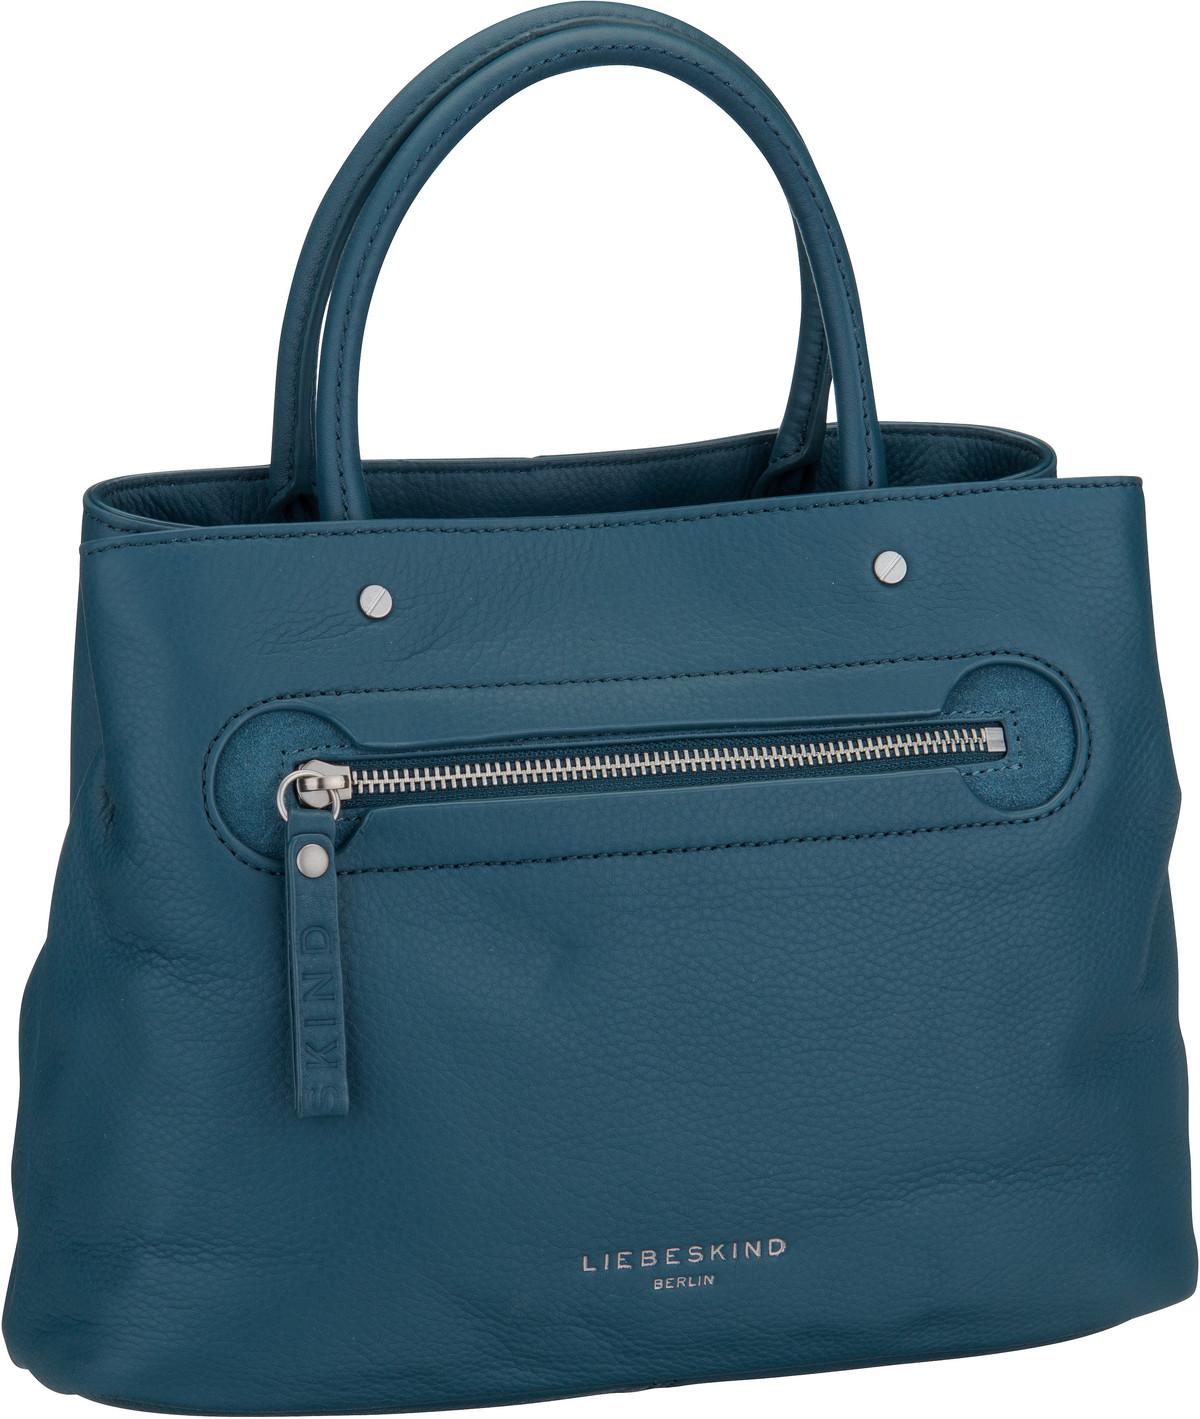 Berlin Handtasche Mini Daily 2 Satchel S China Blue